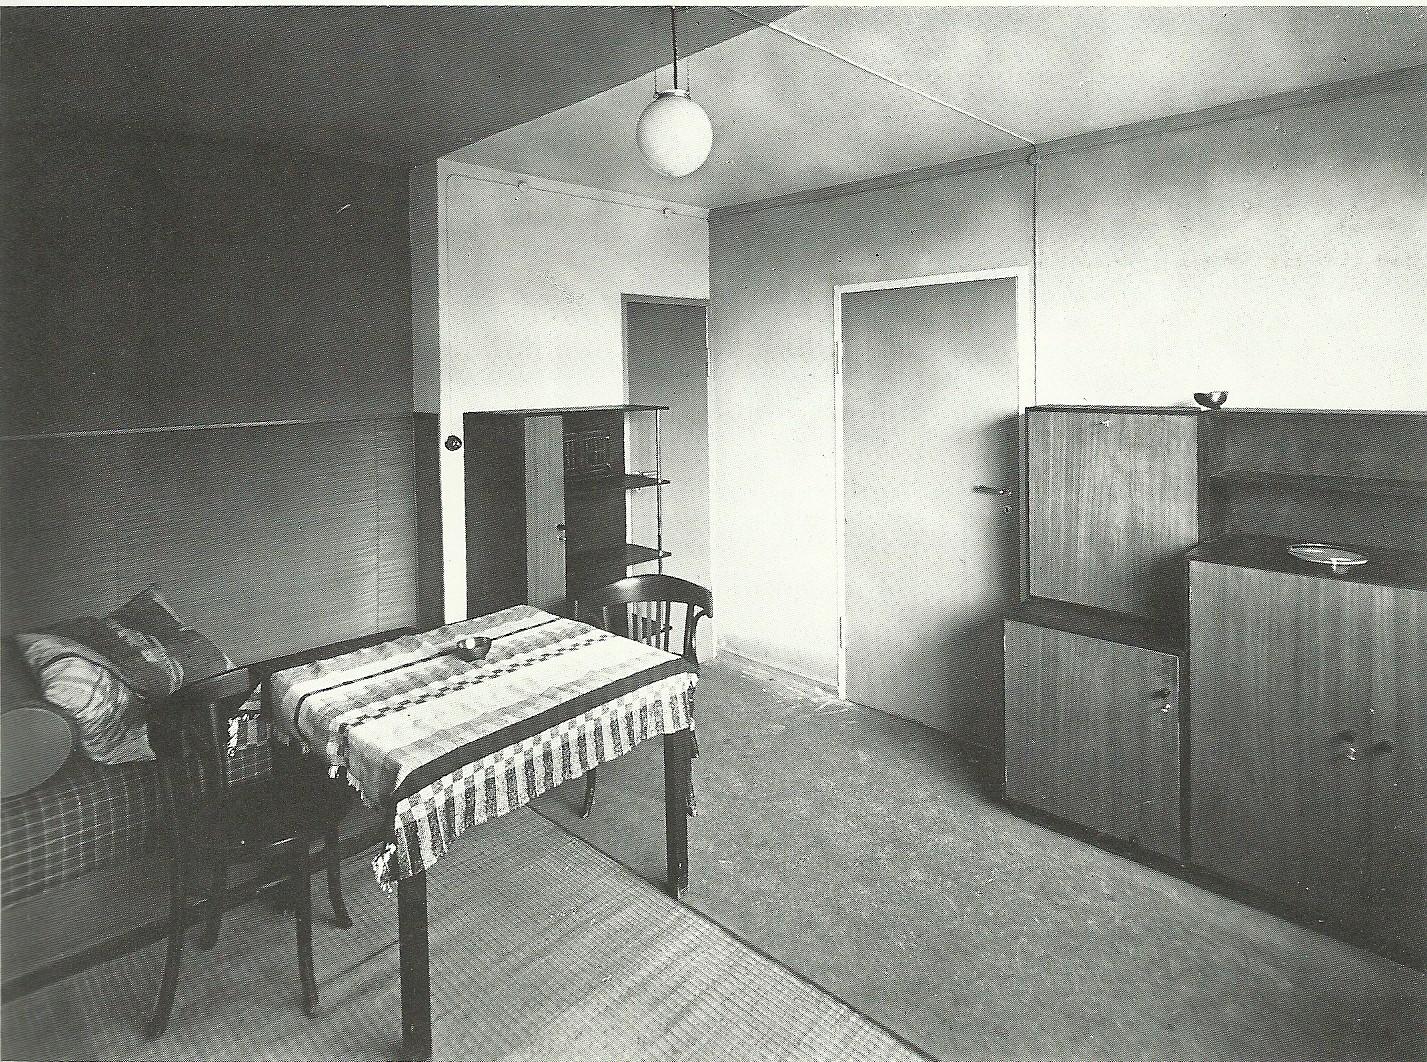 Historia de la arquitectura moderna barrio t rten 1923 for Bauhaus arredamento